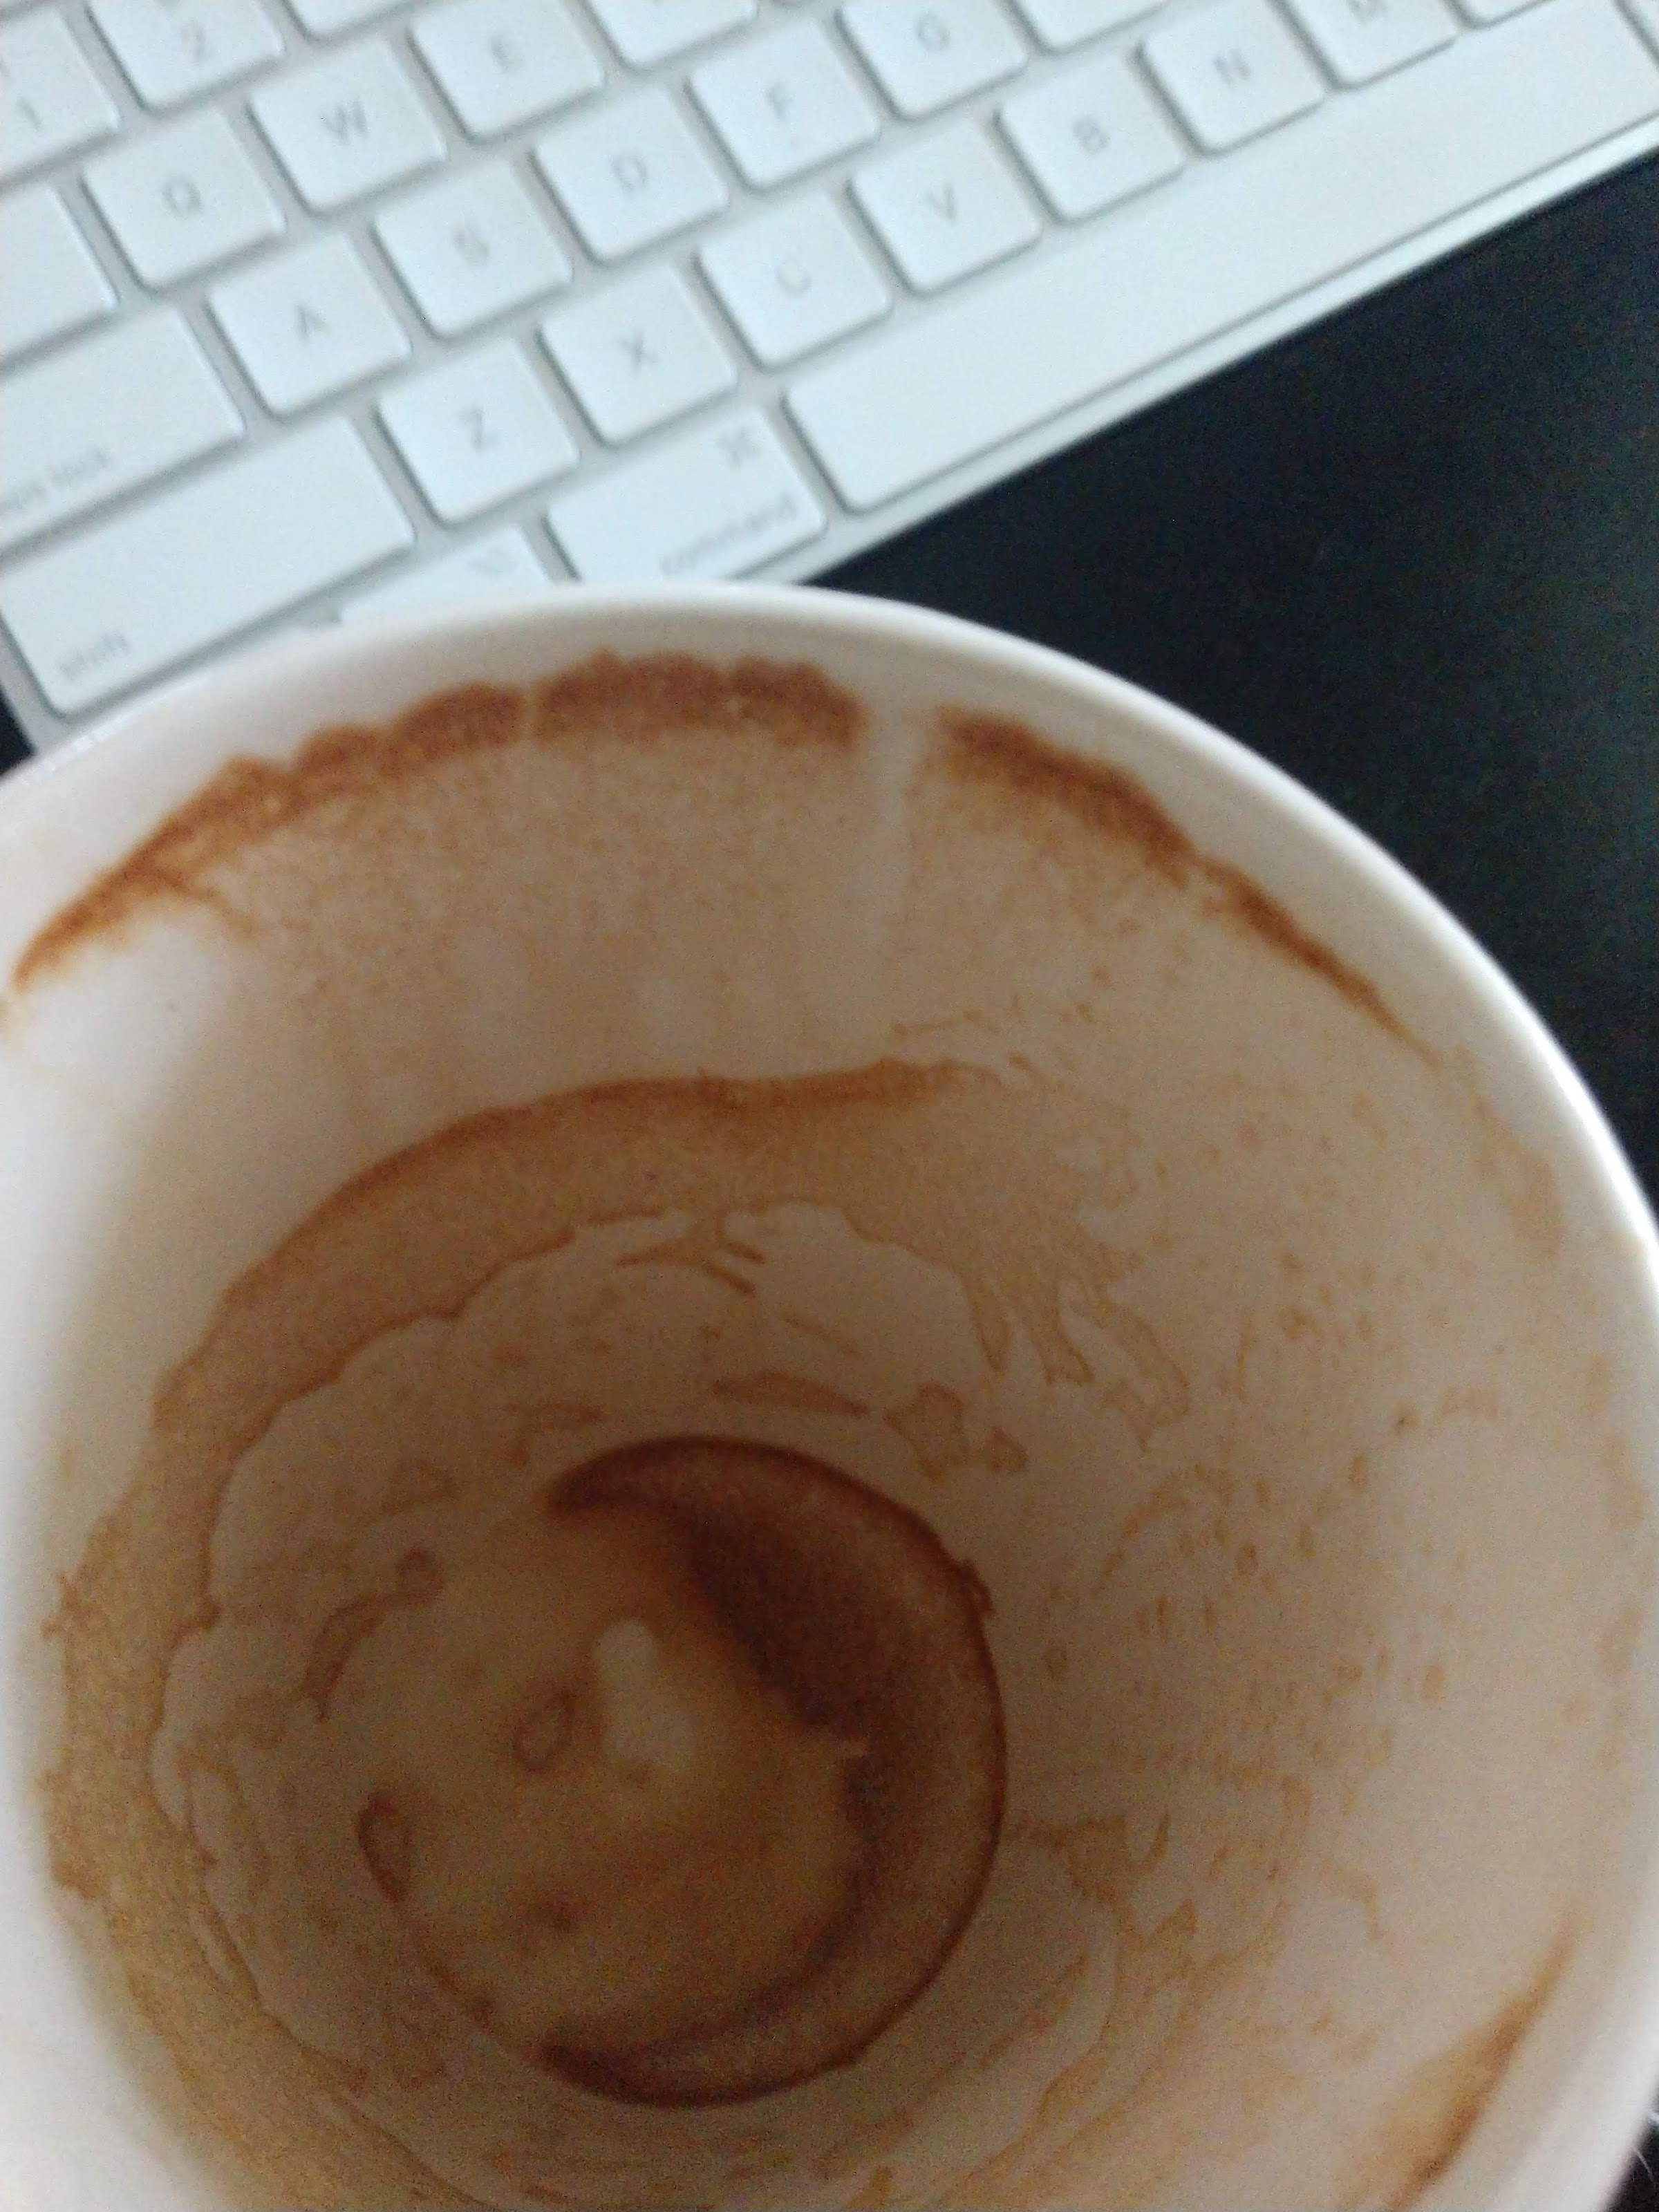 कॉफी कप मॅक कीबोर्ड